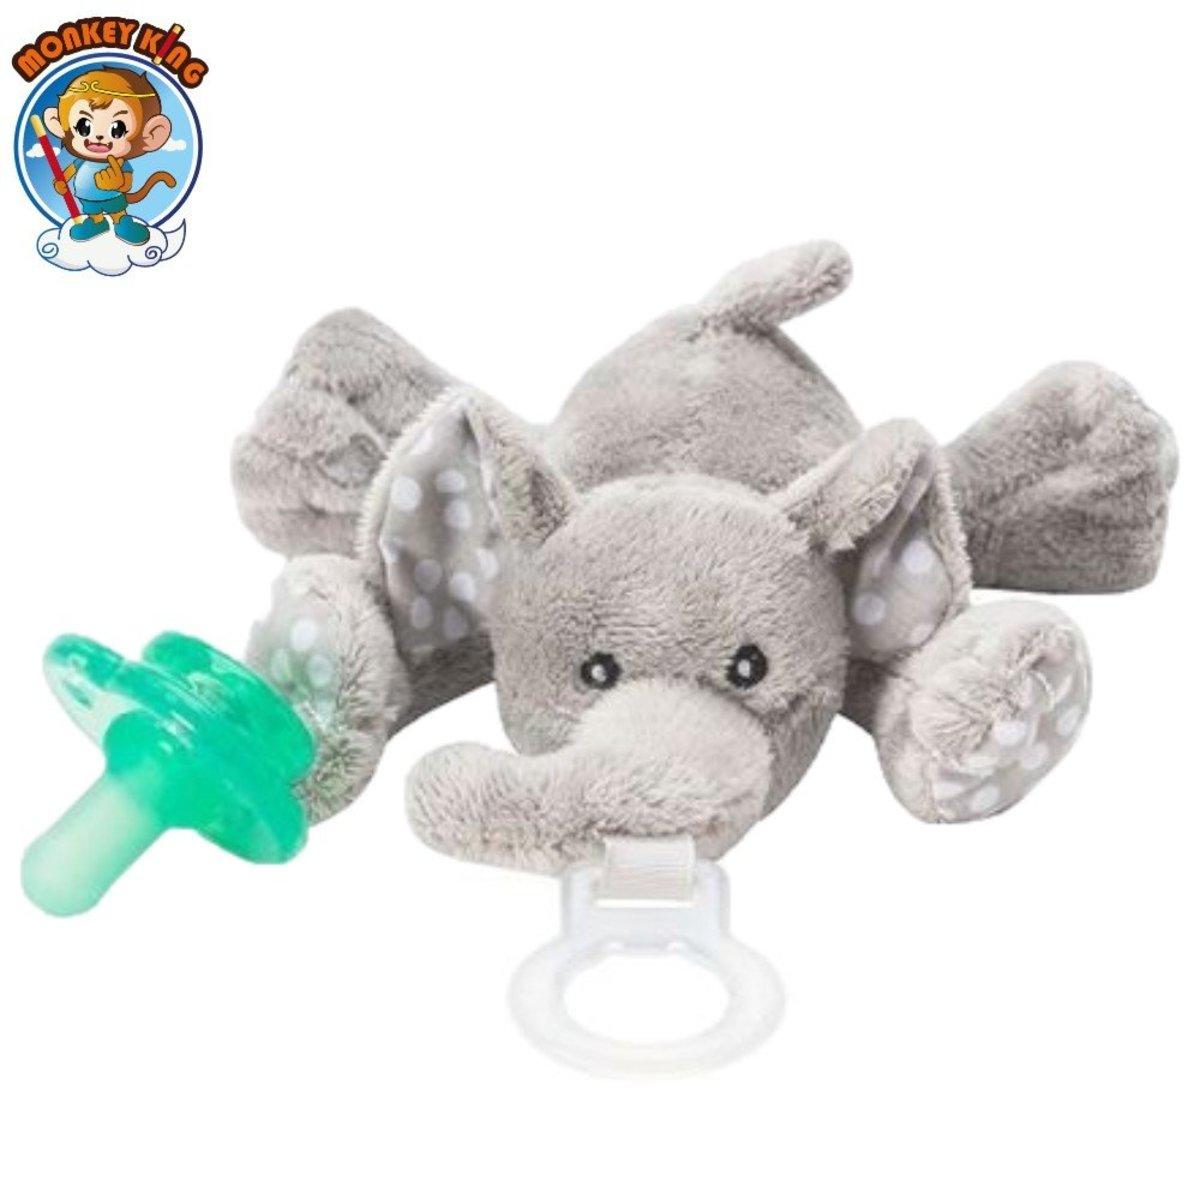 Paci-Plushies Buddies Pacifier Holder - Elephant